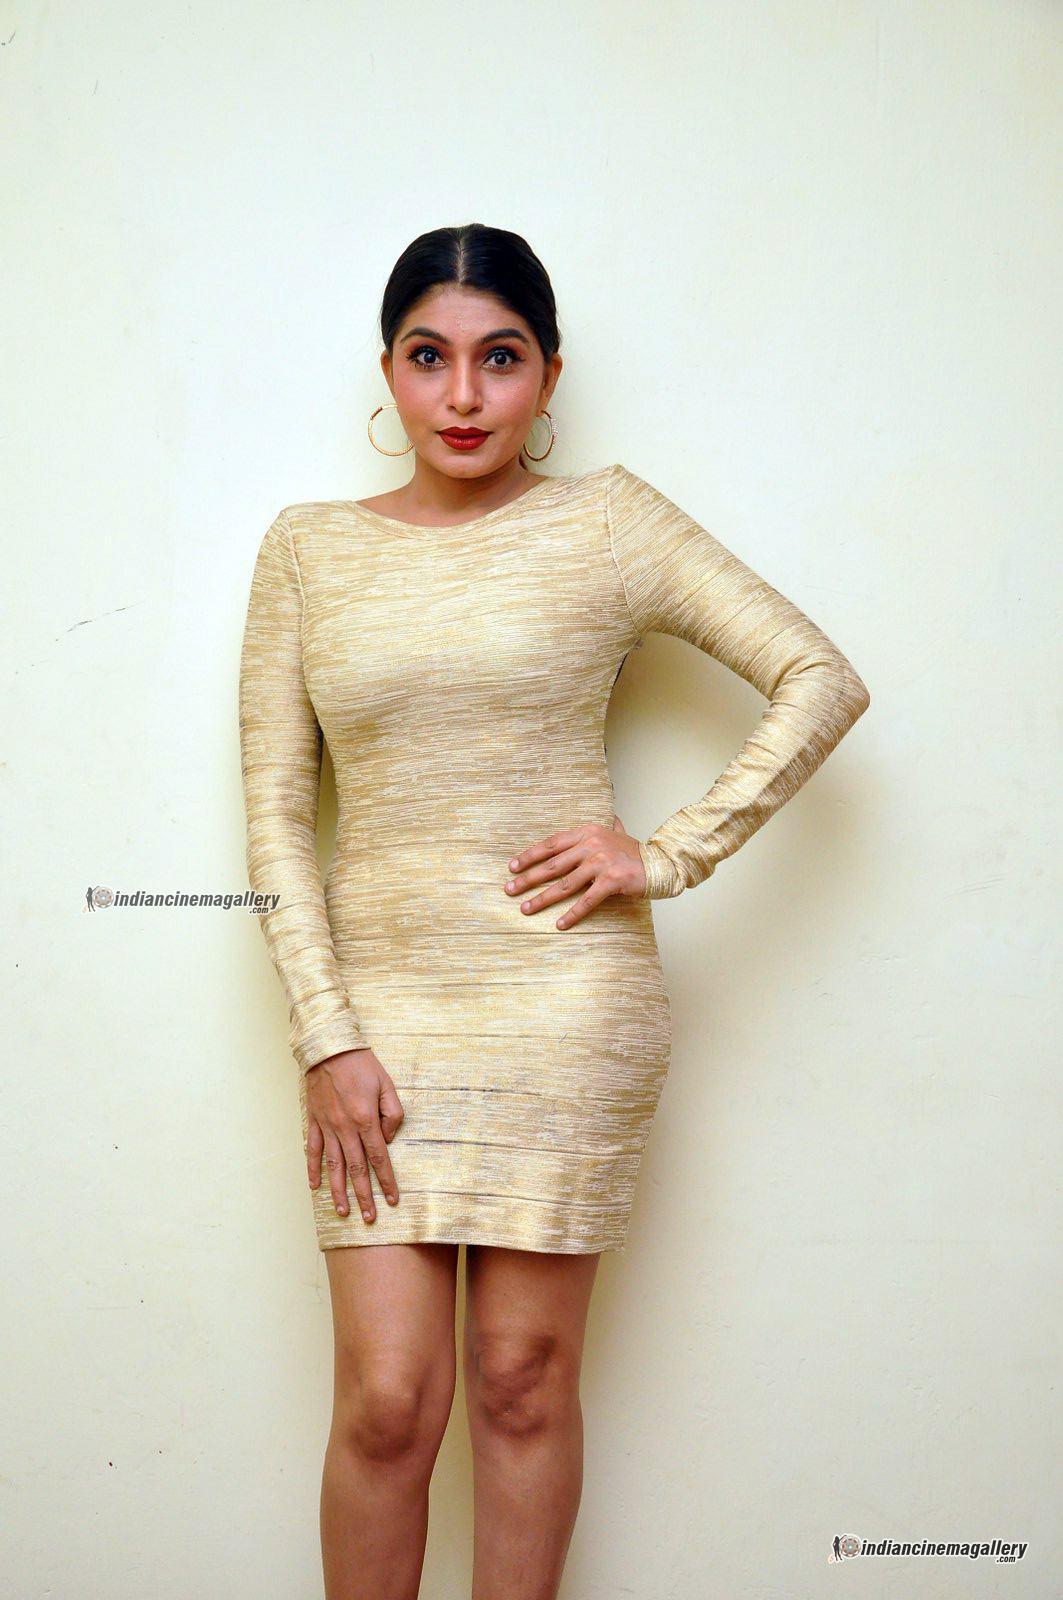 pooja-roshan-at-box-movie-audio-launch-202210